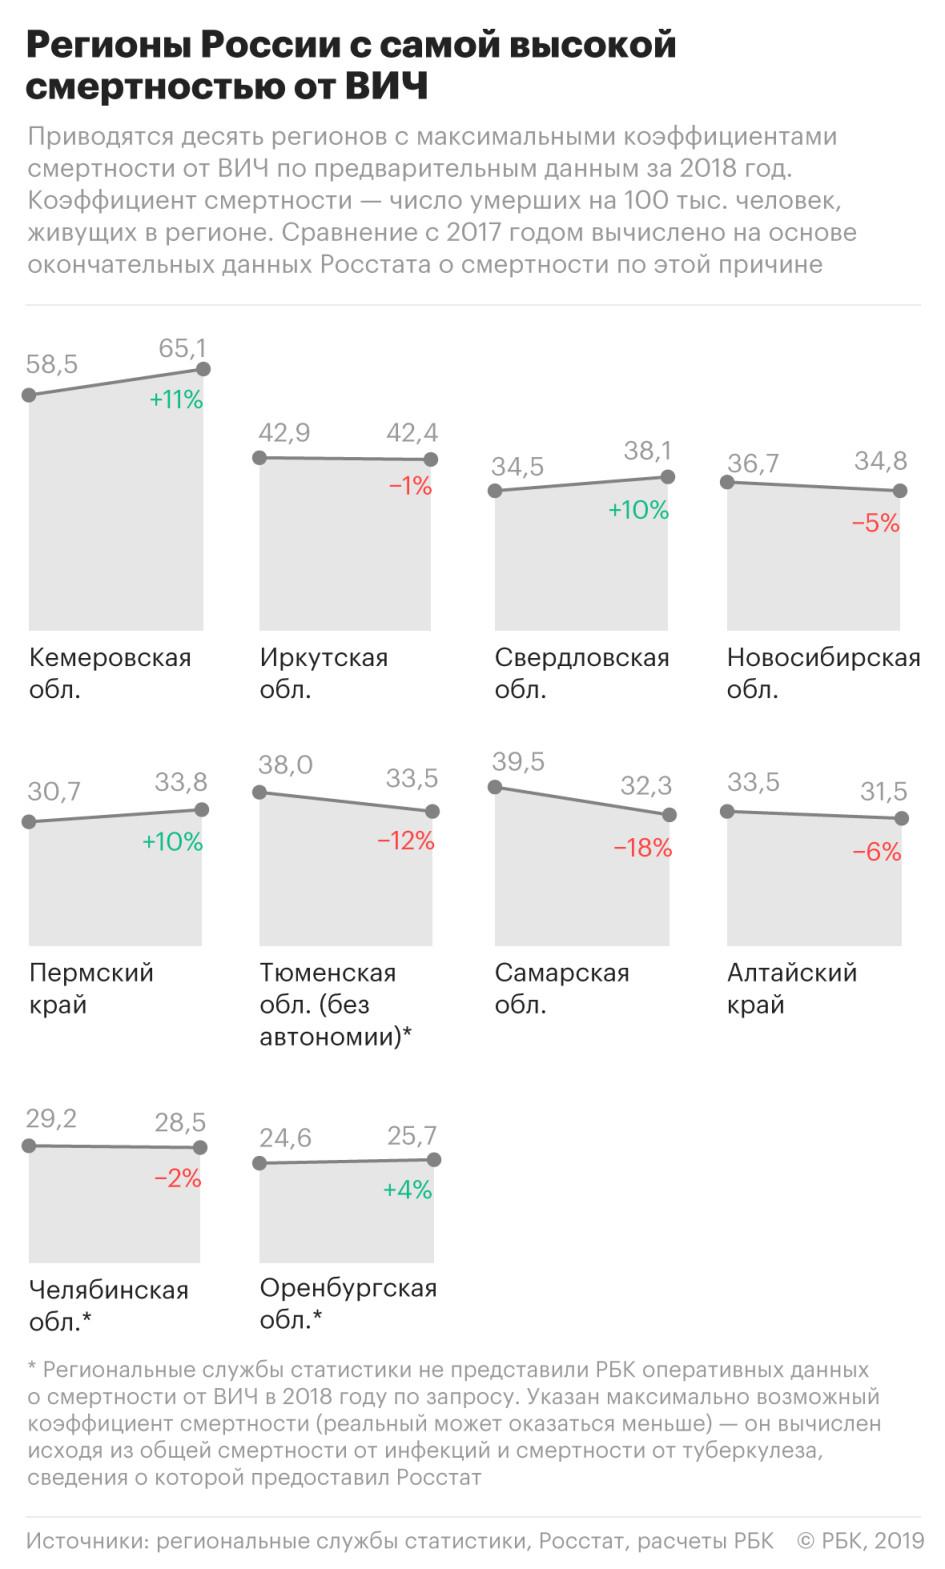 https://s0.rbk.ru/v6_top_pics/resized/945xH/media/img/7/03/755522824192037.jpeg